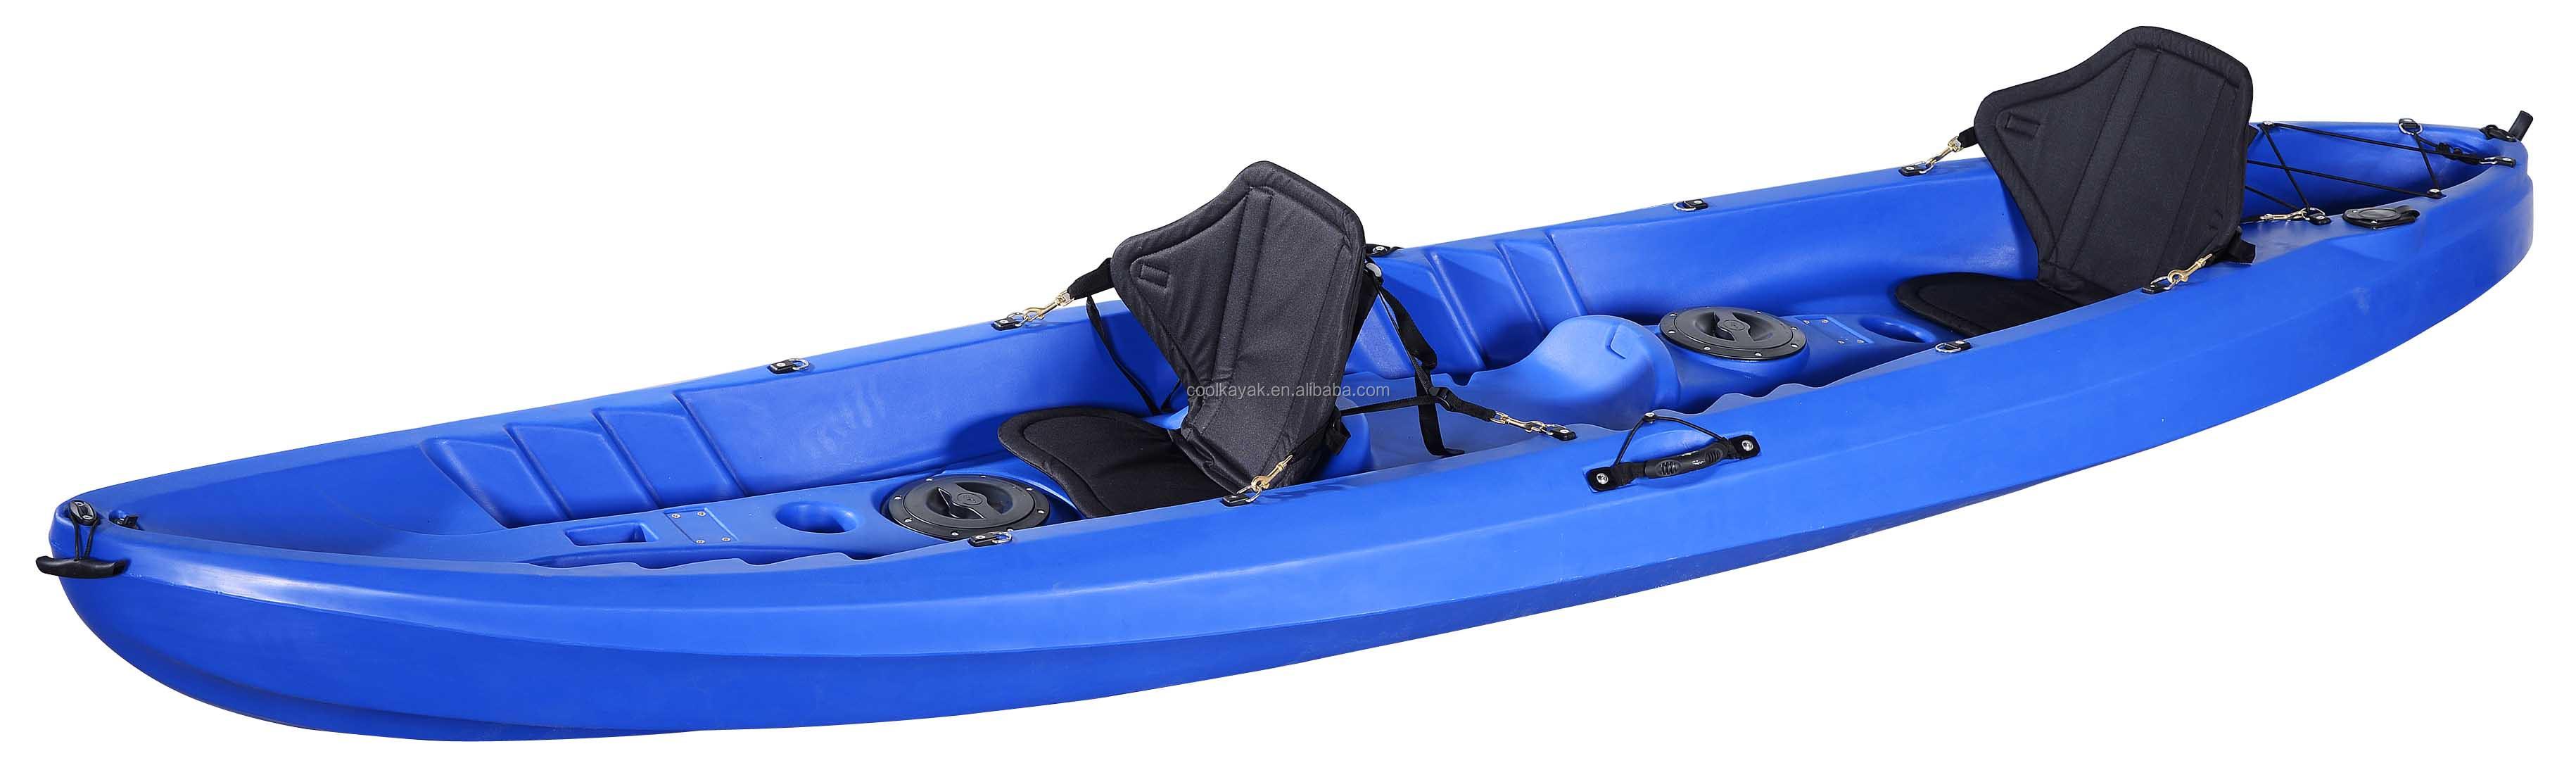 Cheap 2 person fishing kayak for Best cheap fishing kayak